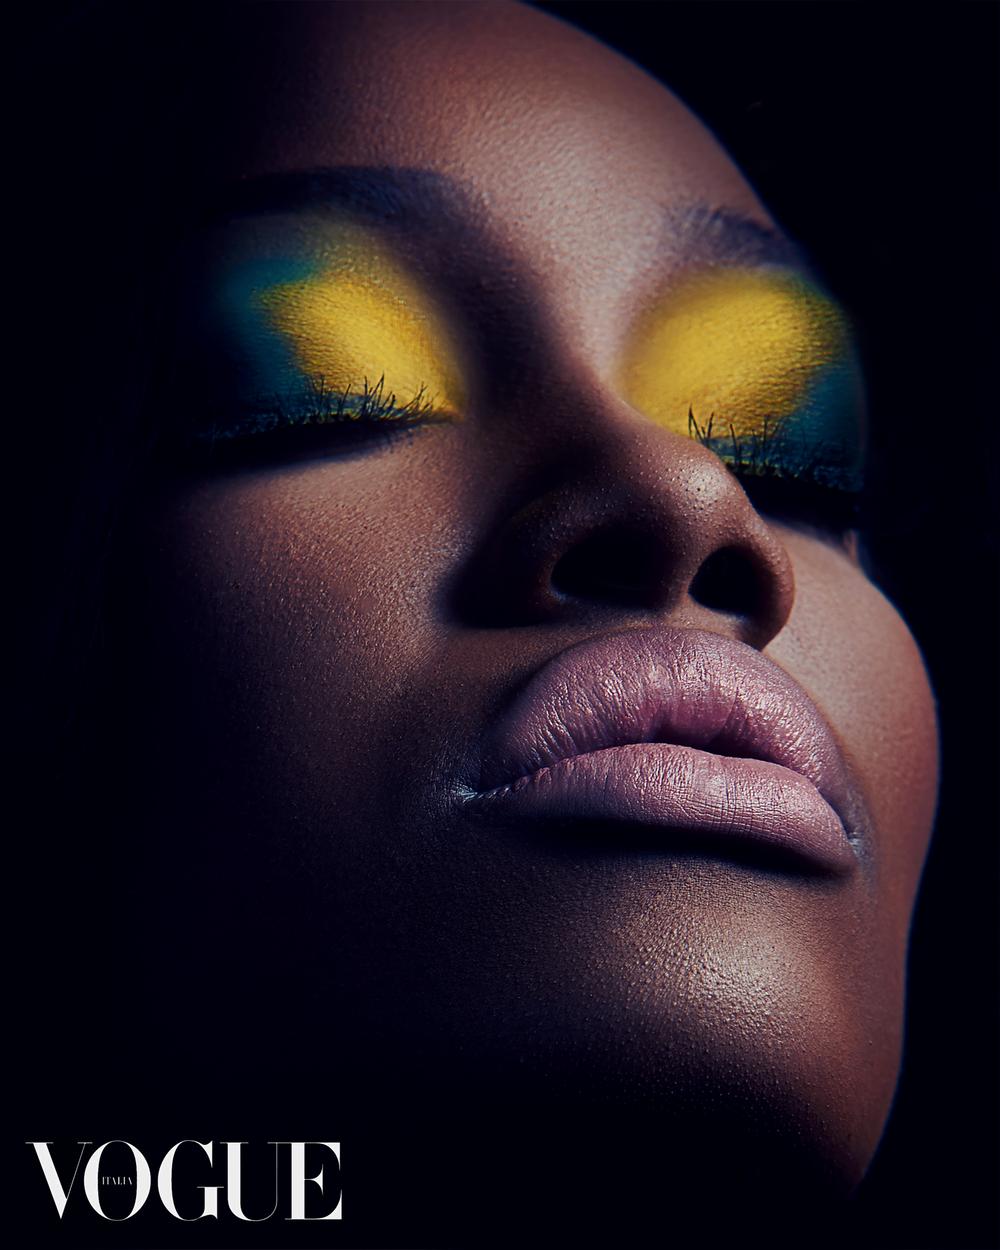 Vogue Italia, January 2019 Digital Edition featuring Ire Yardi by Antonio Martez